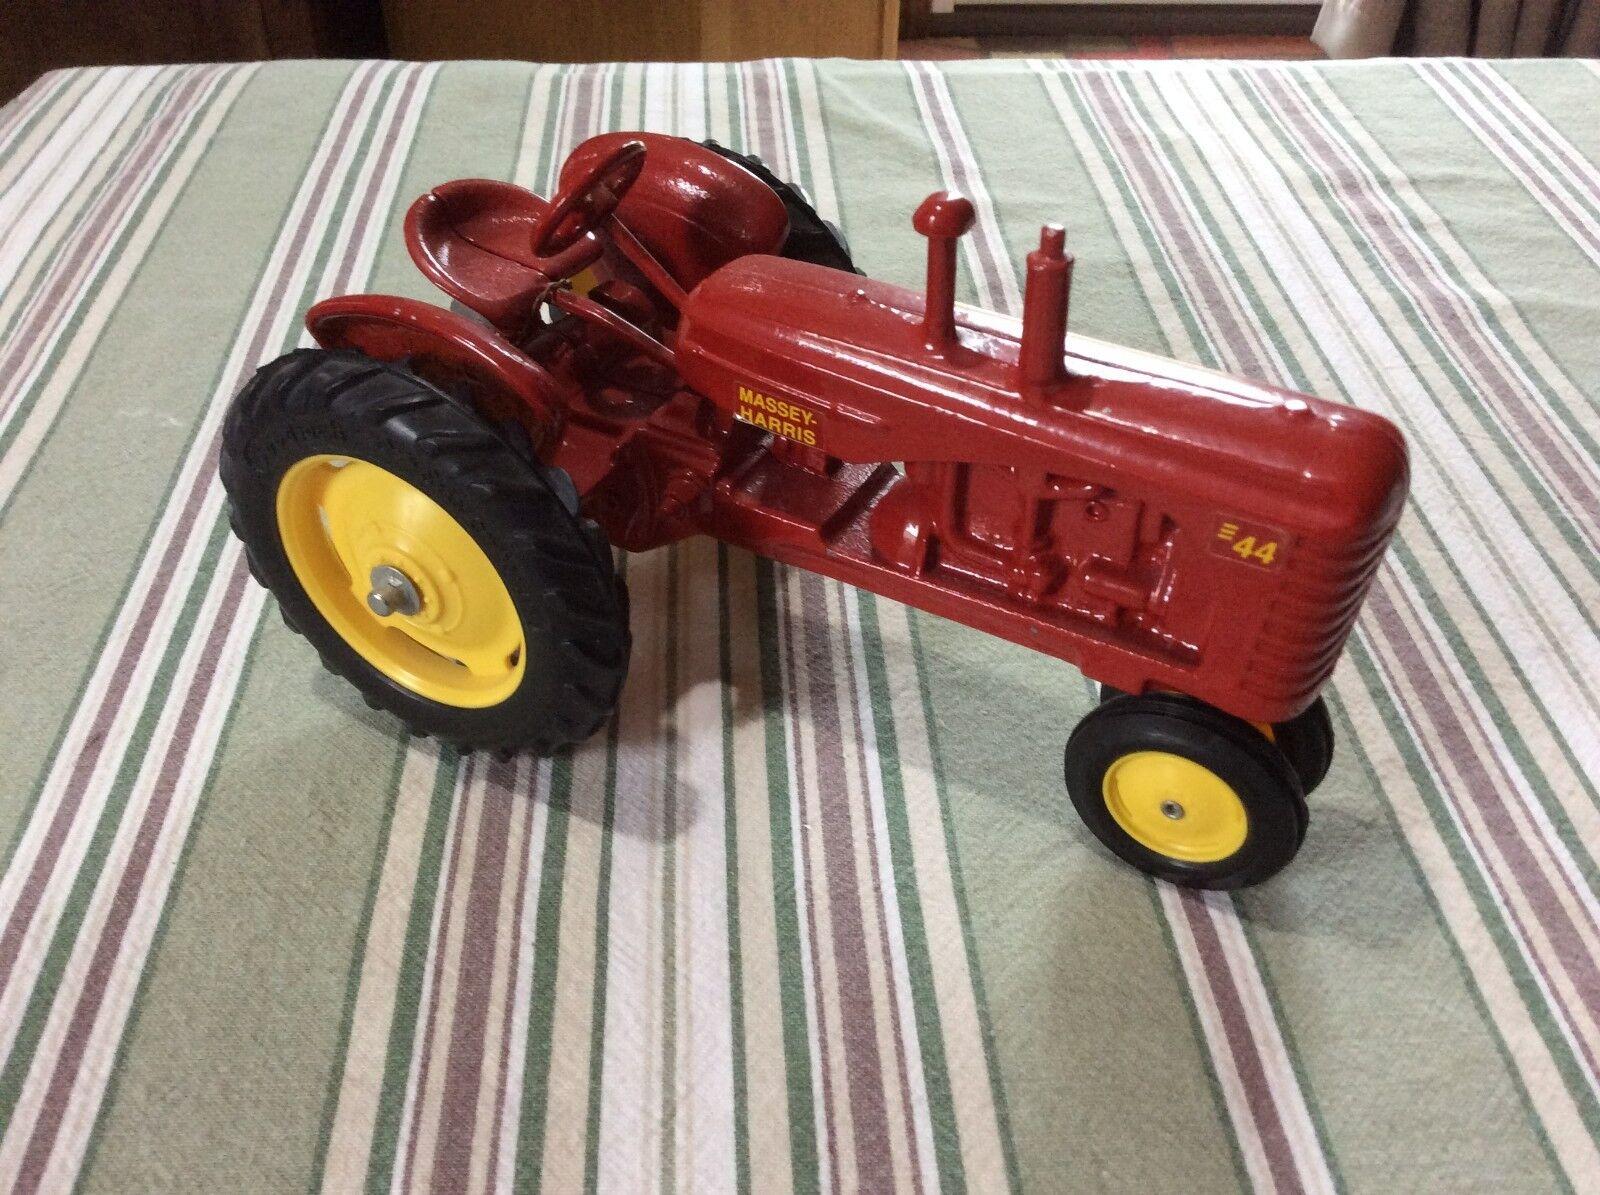 ERTL 1 16 Die-cast Massey Harris 44 Narrow Front Farm Tractor